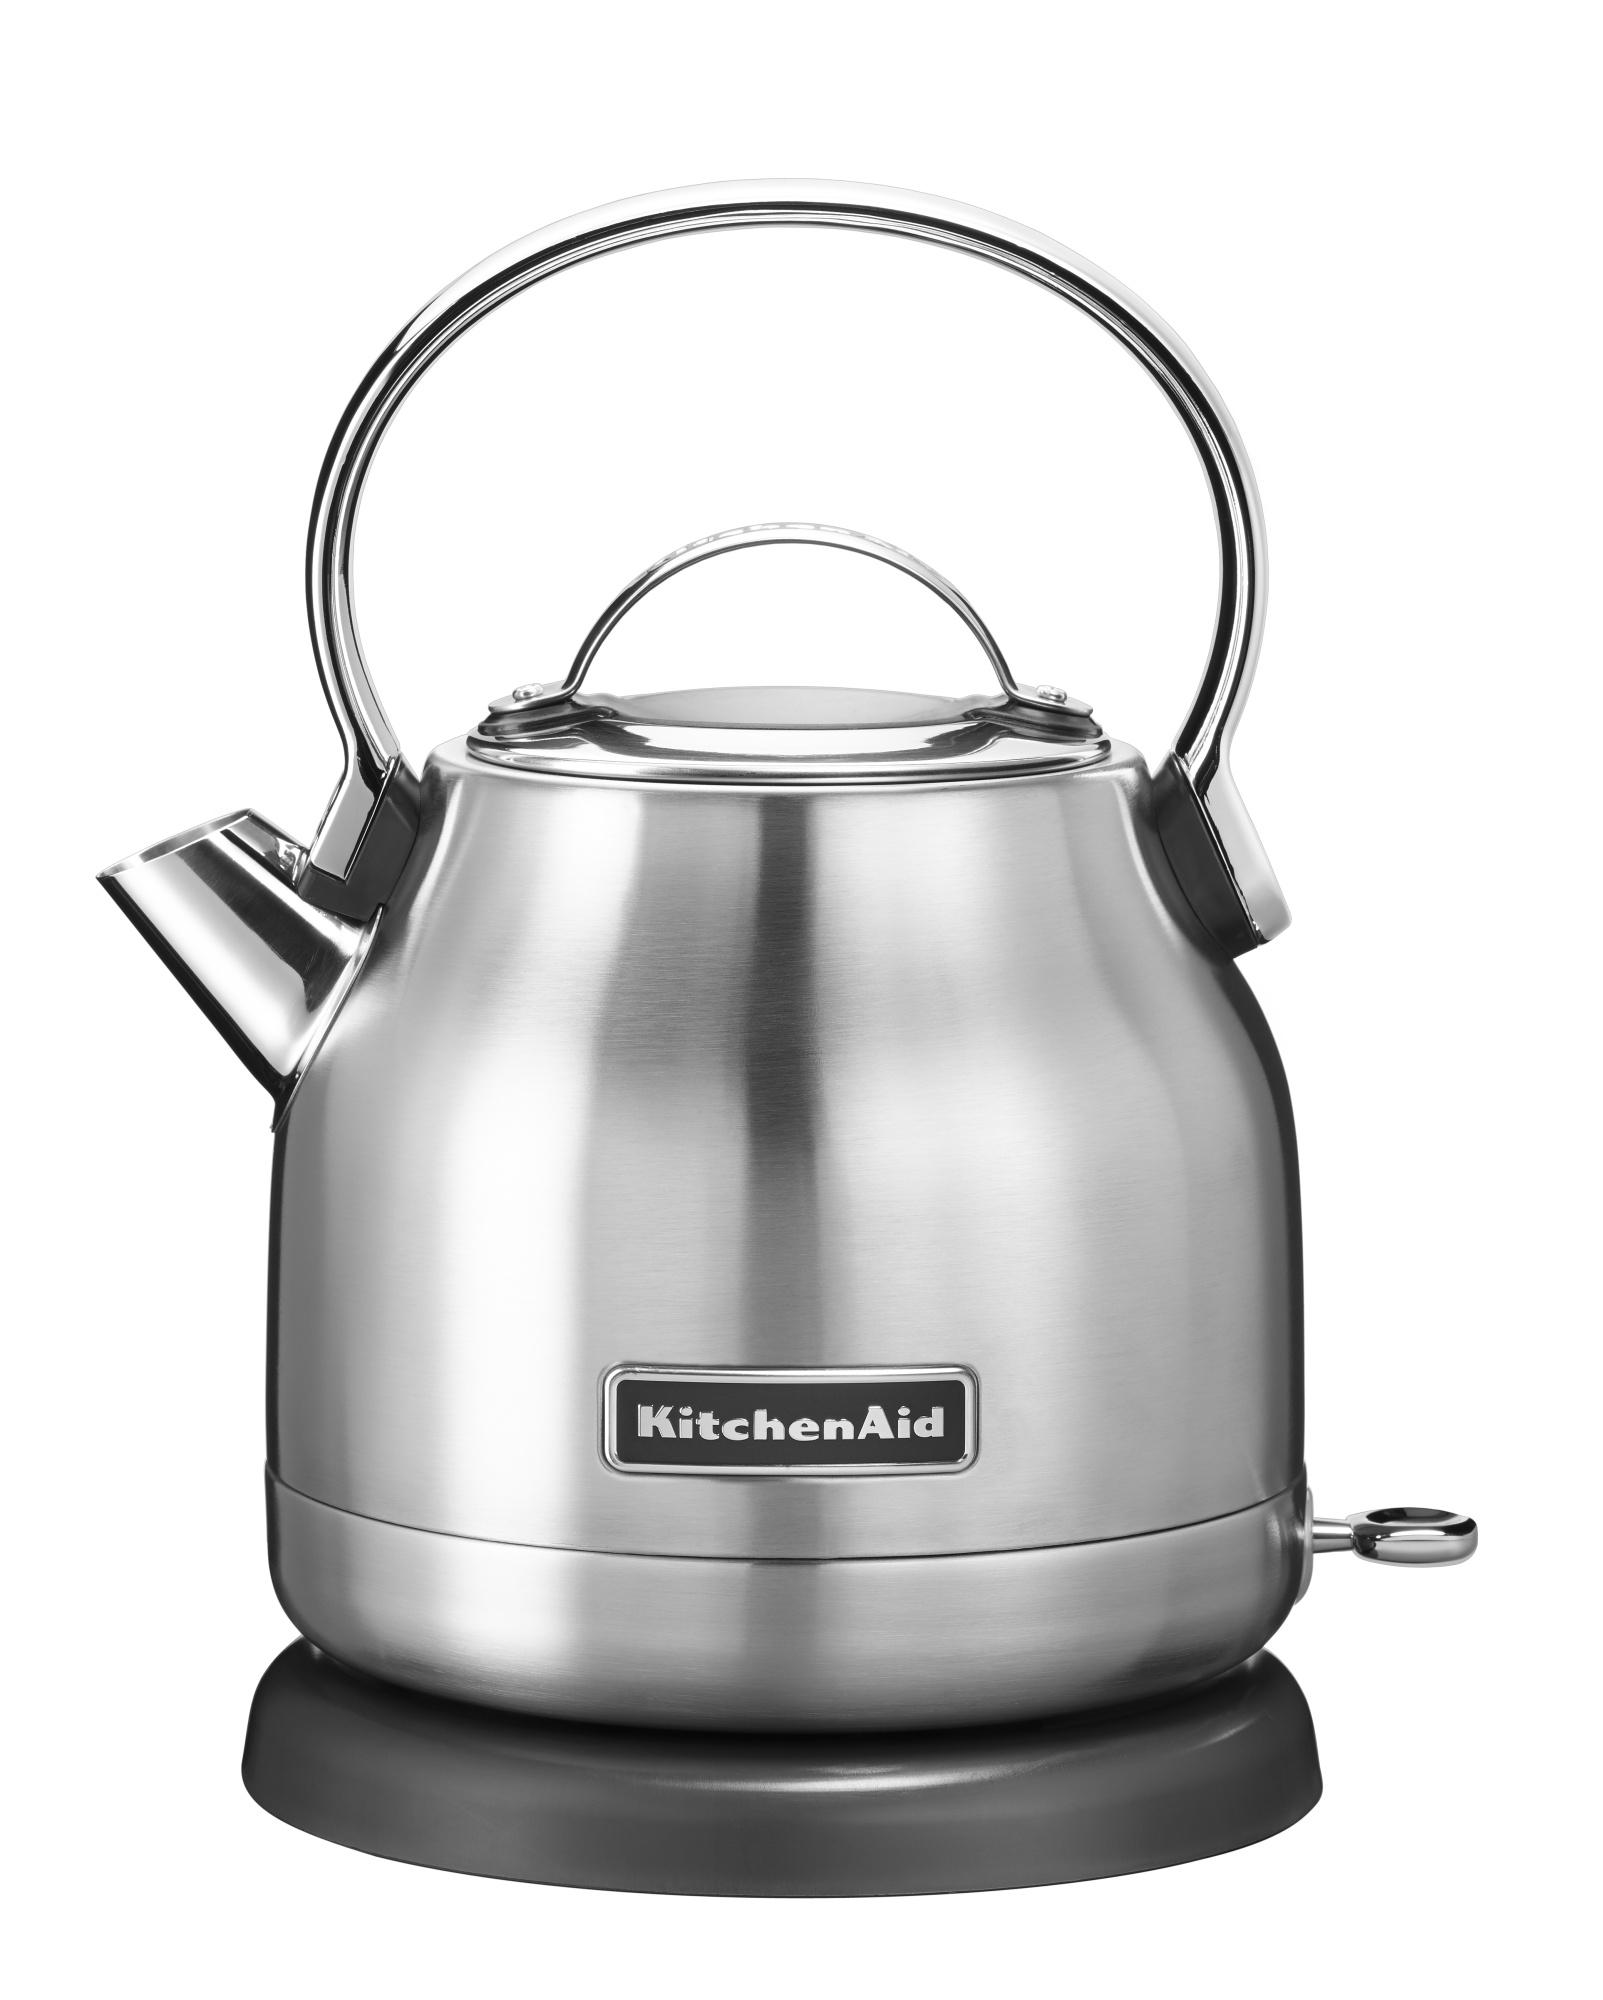 Rychlovarná konvice 1,25 l nerez KitchenAid - KitchenAid 5KEK1222